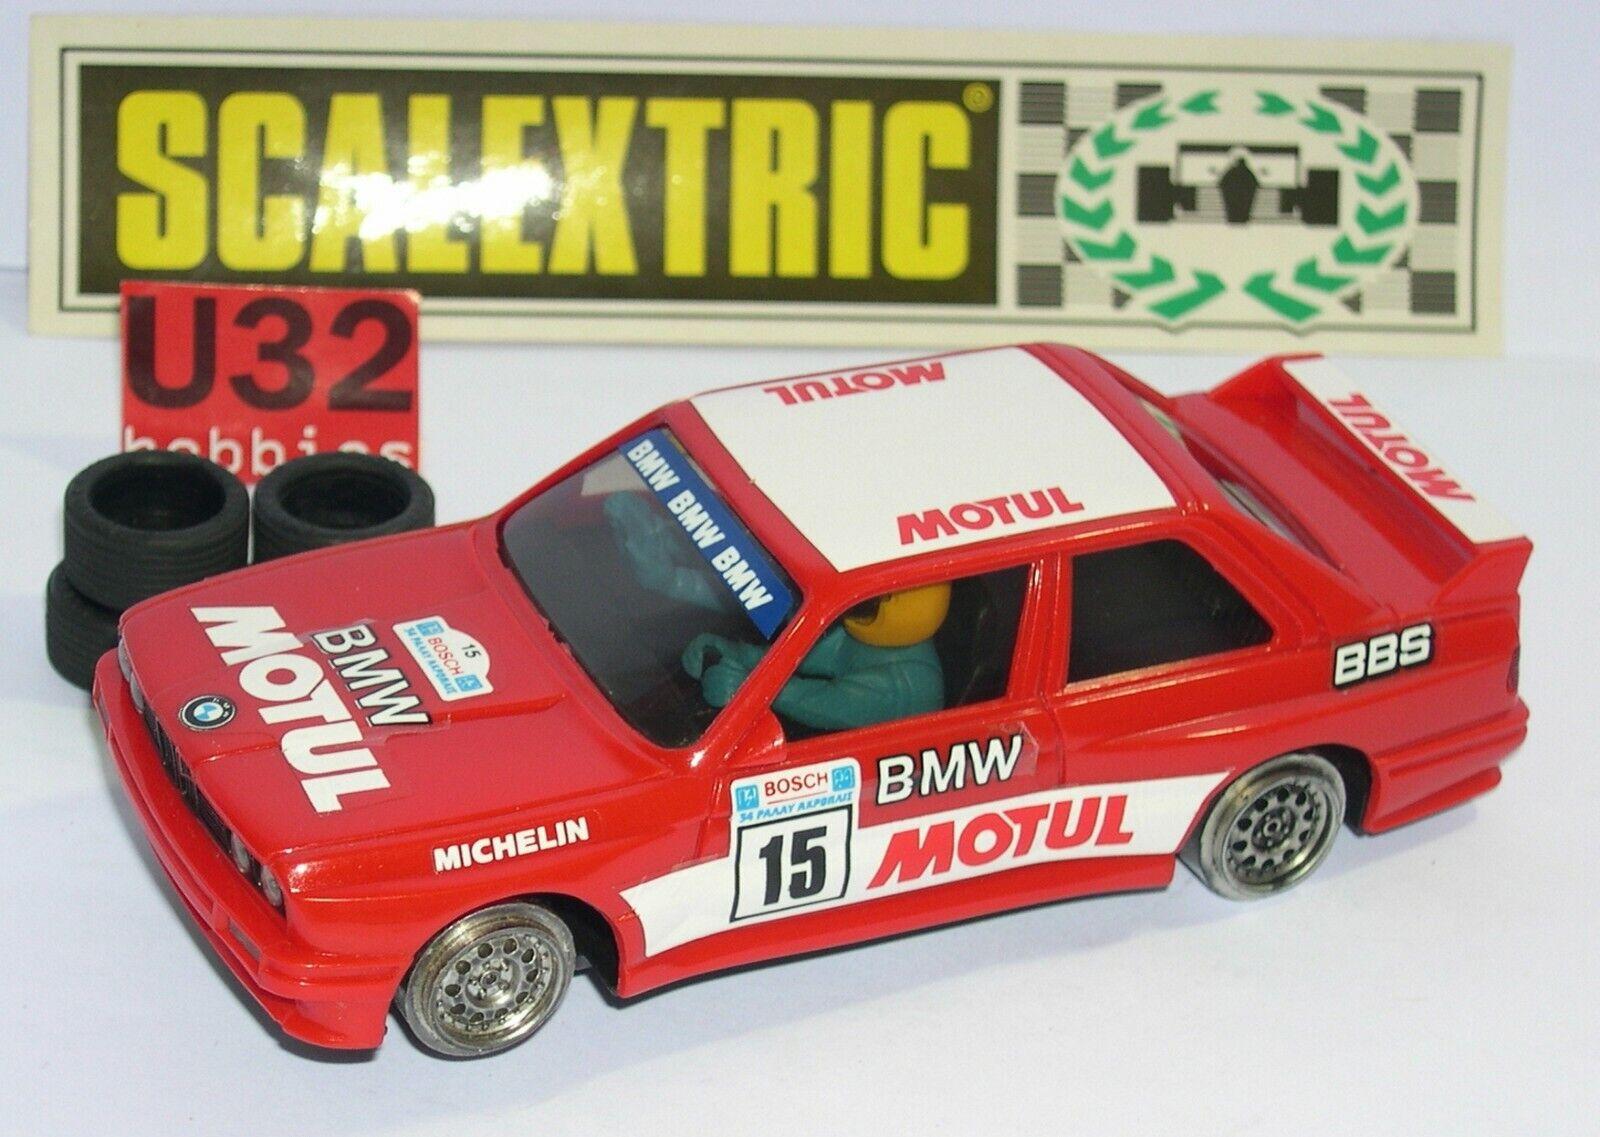 Scalextric Exin 4092 BMW M3 #15 Motul Eccellente Condizioni Unboxed